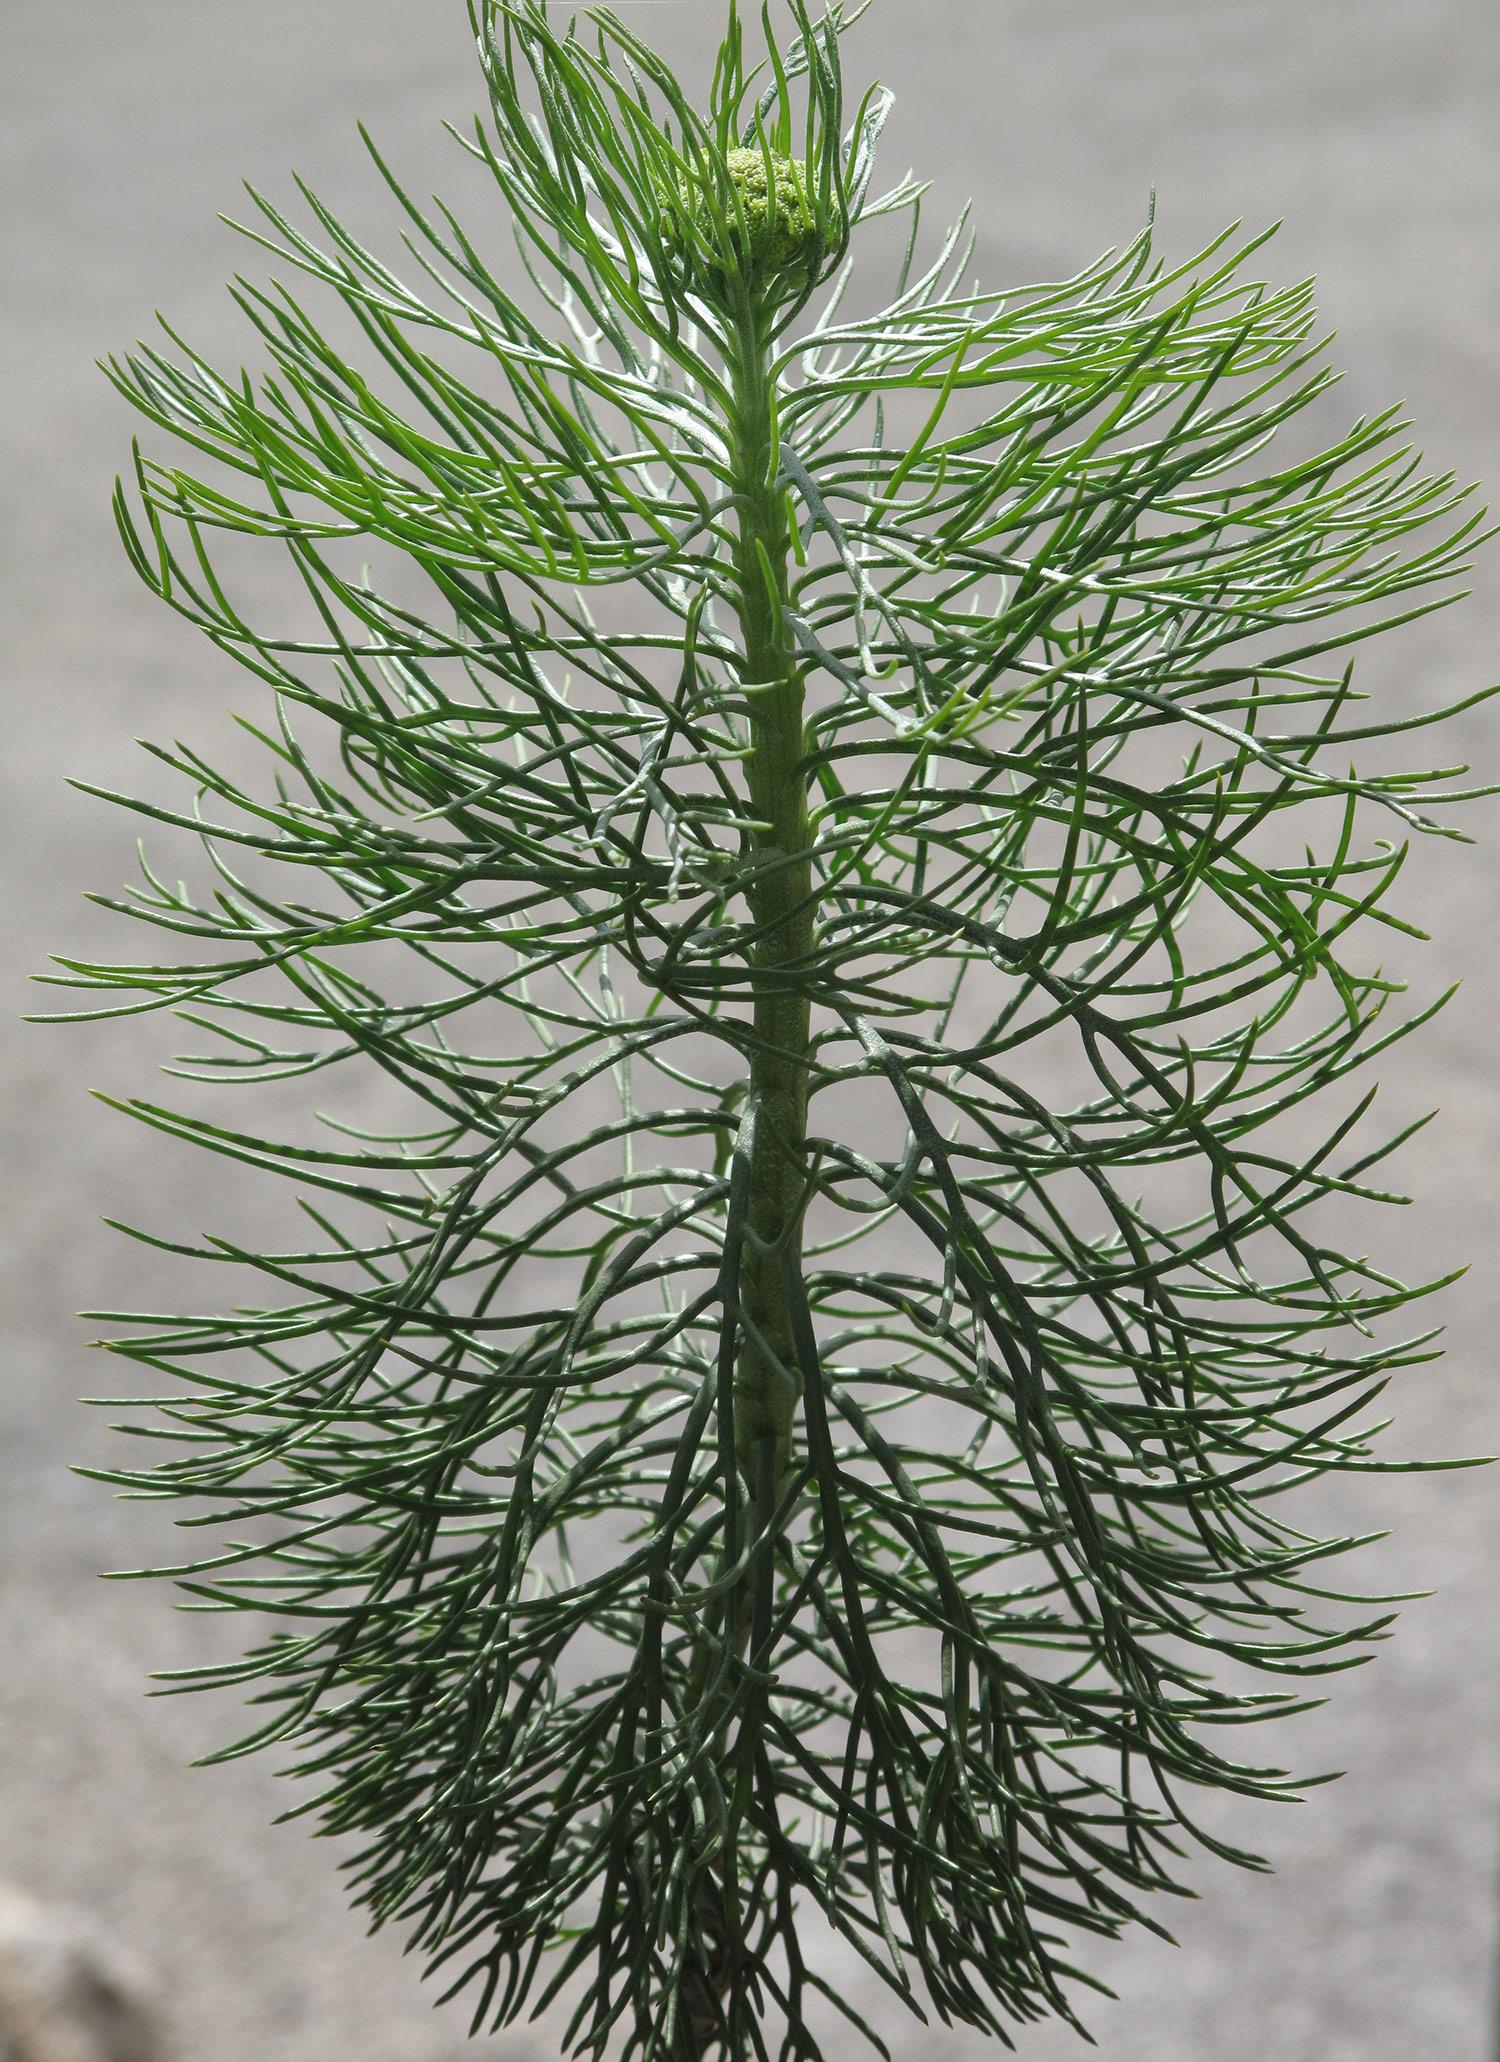 Athanasia-crithmifolia-10-